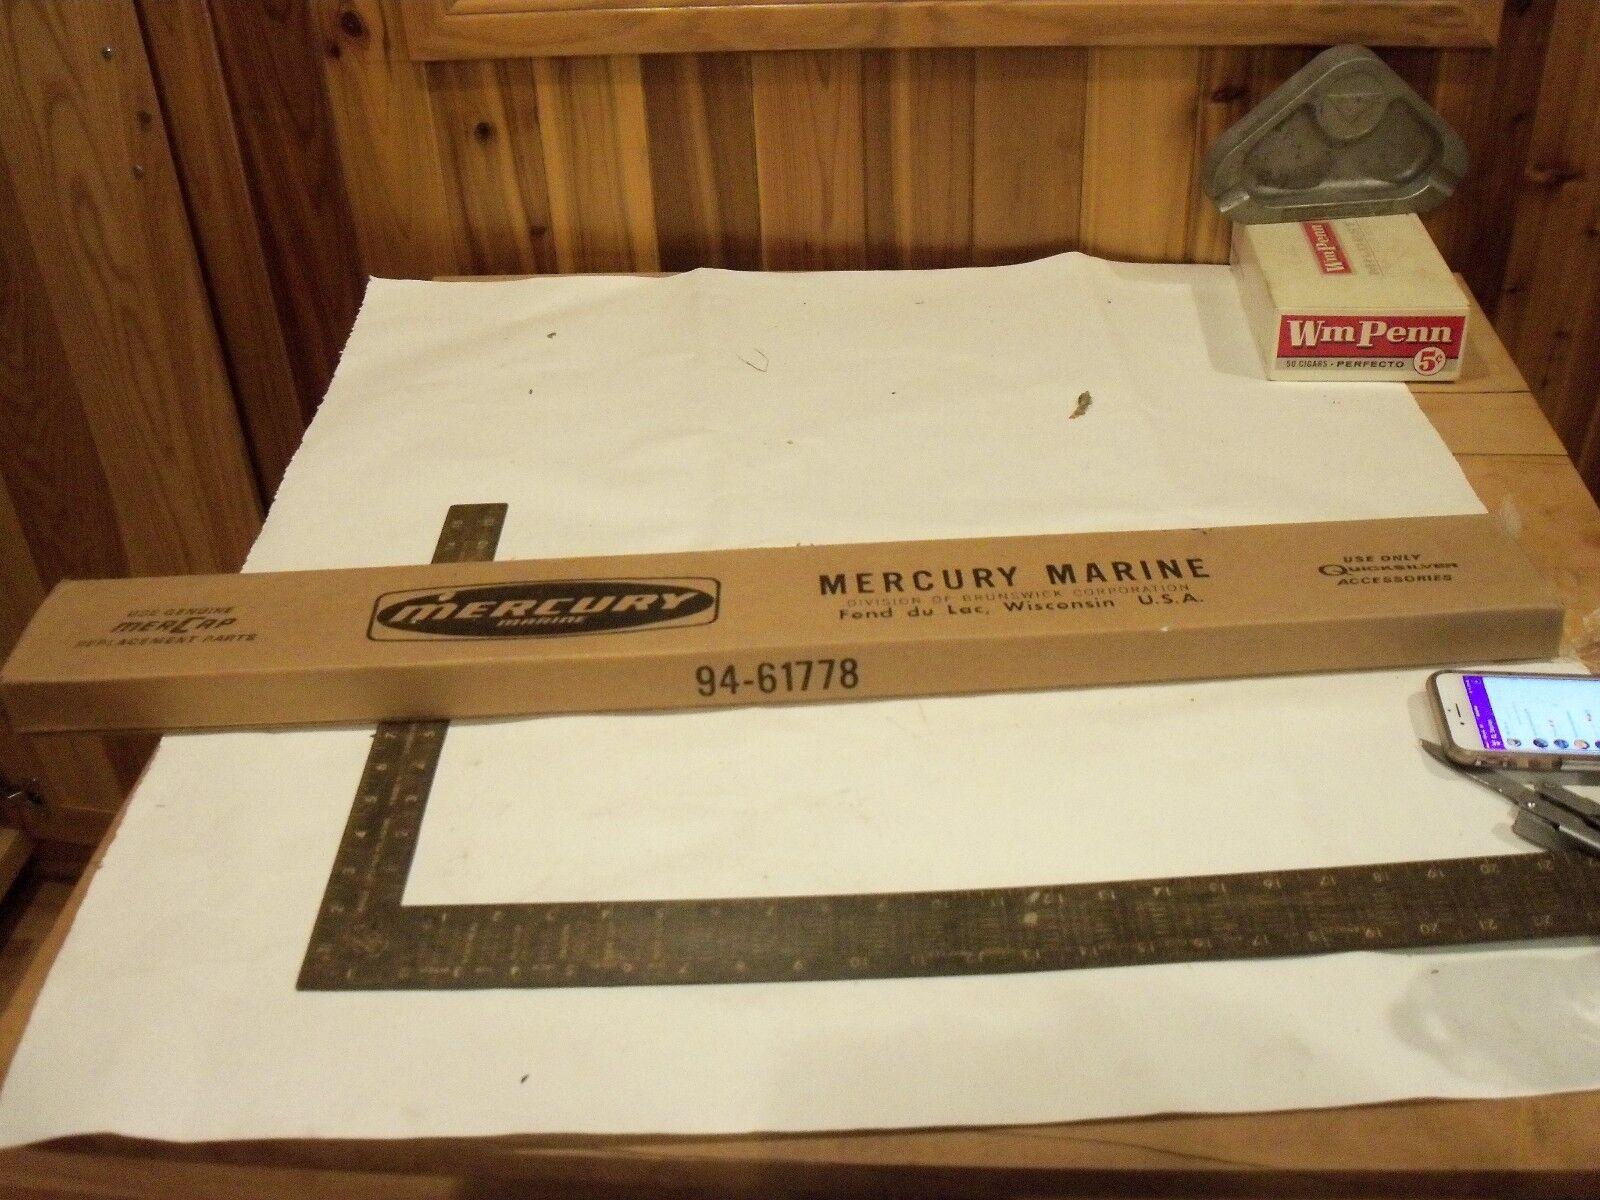 Vintage Mercury snomobile carbide set - 94-61778